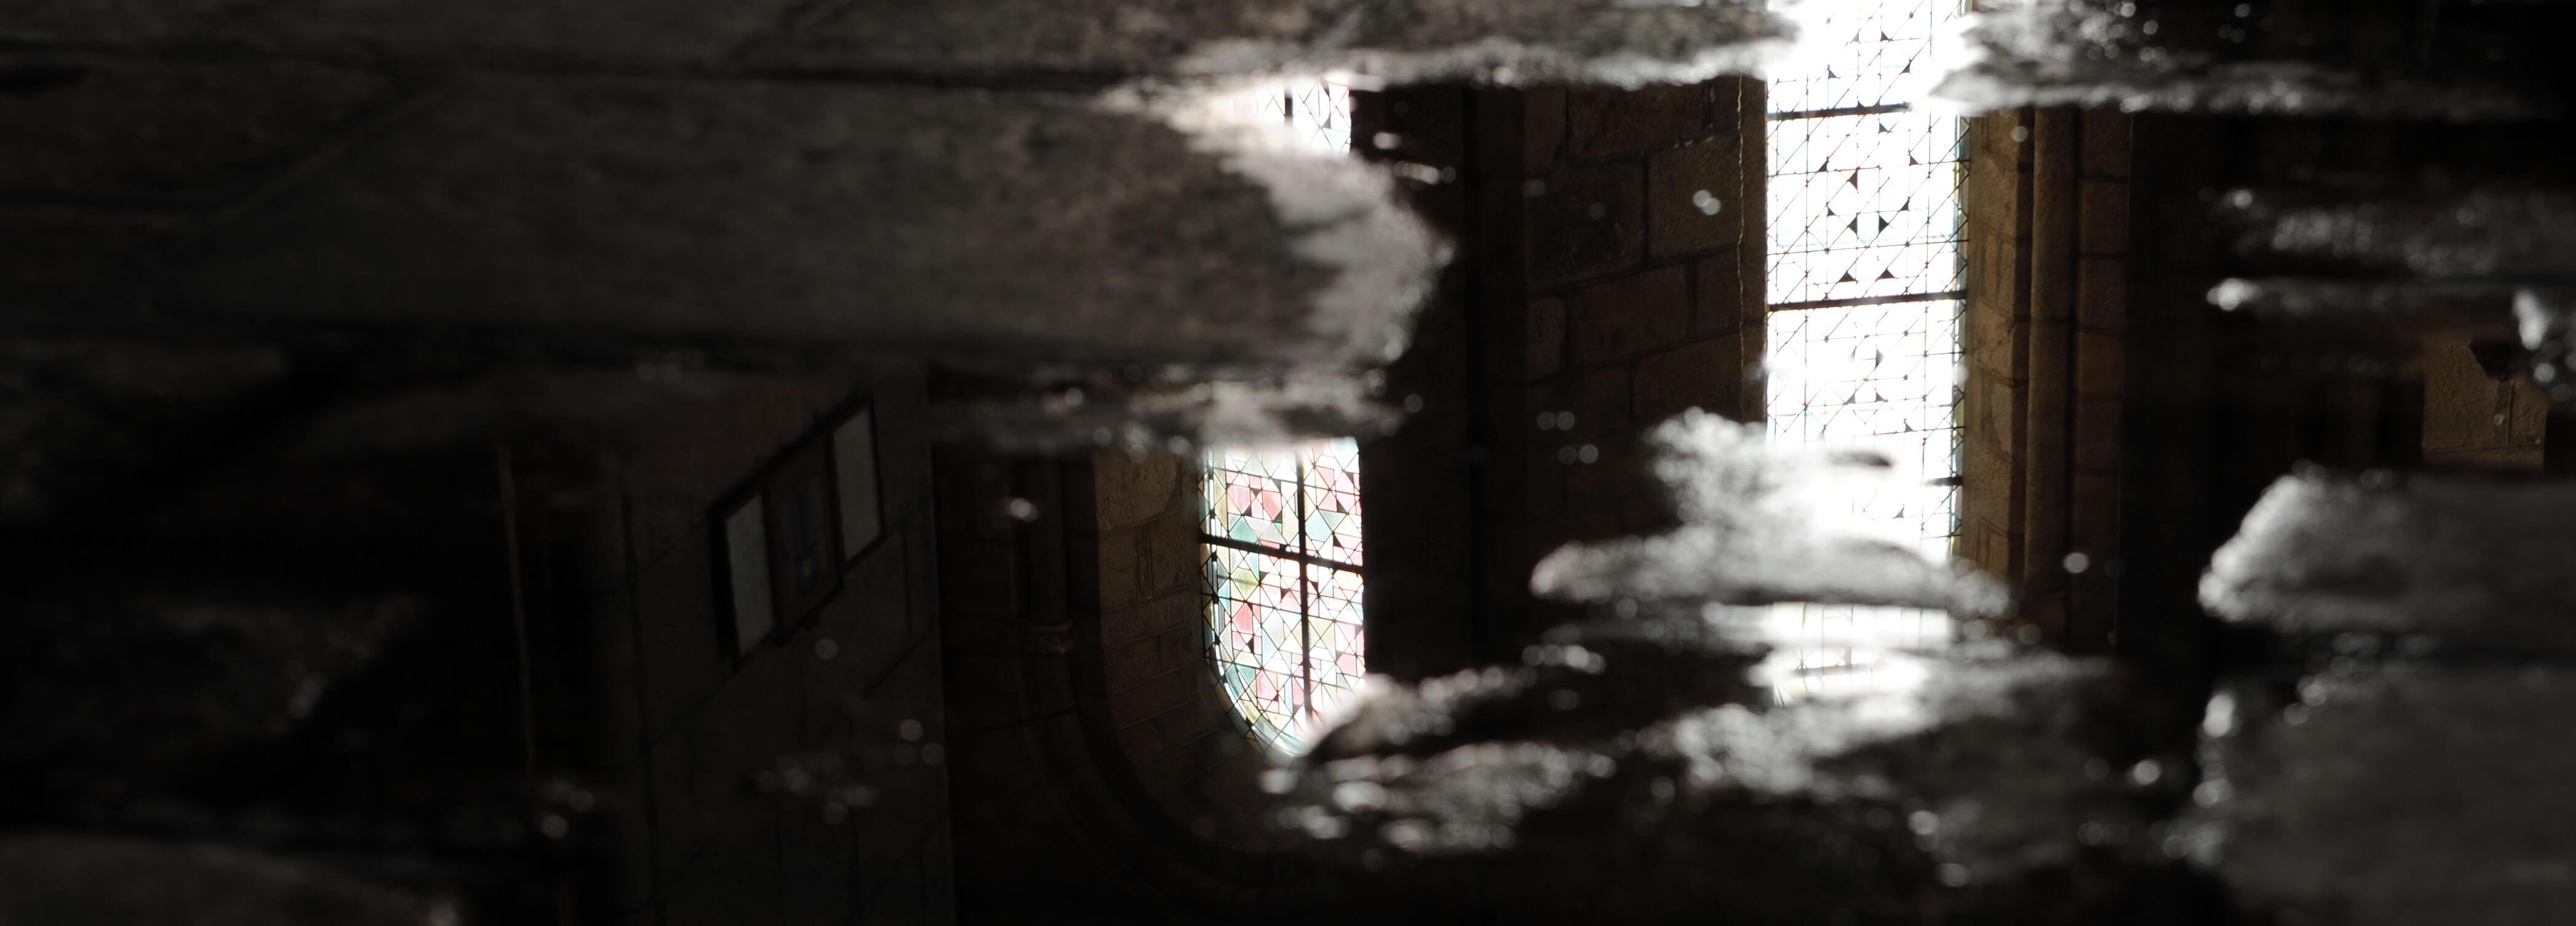 Eglise Saint-Léonard©ACIR / JJ Gelbart